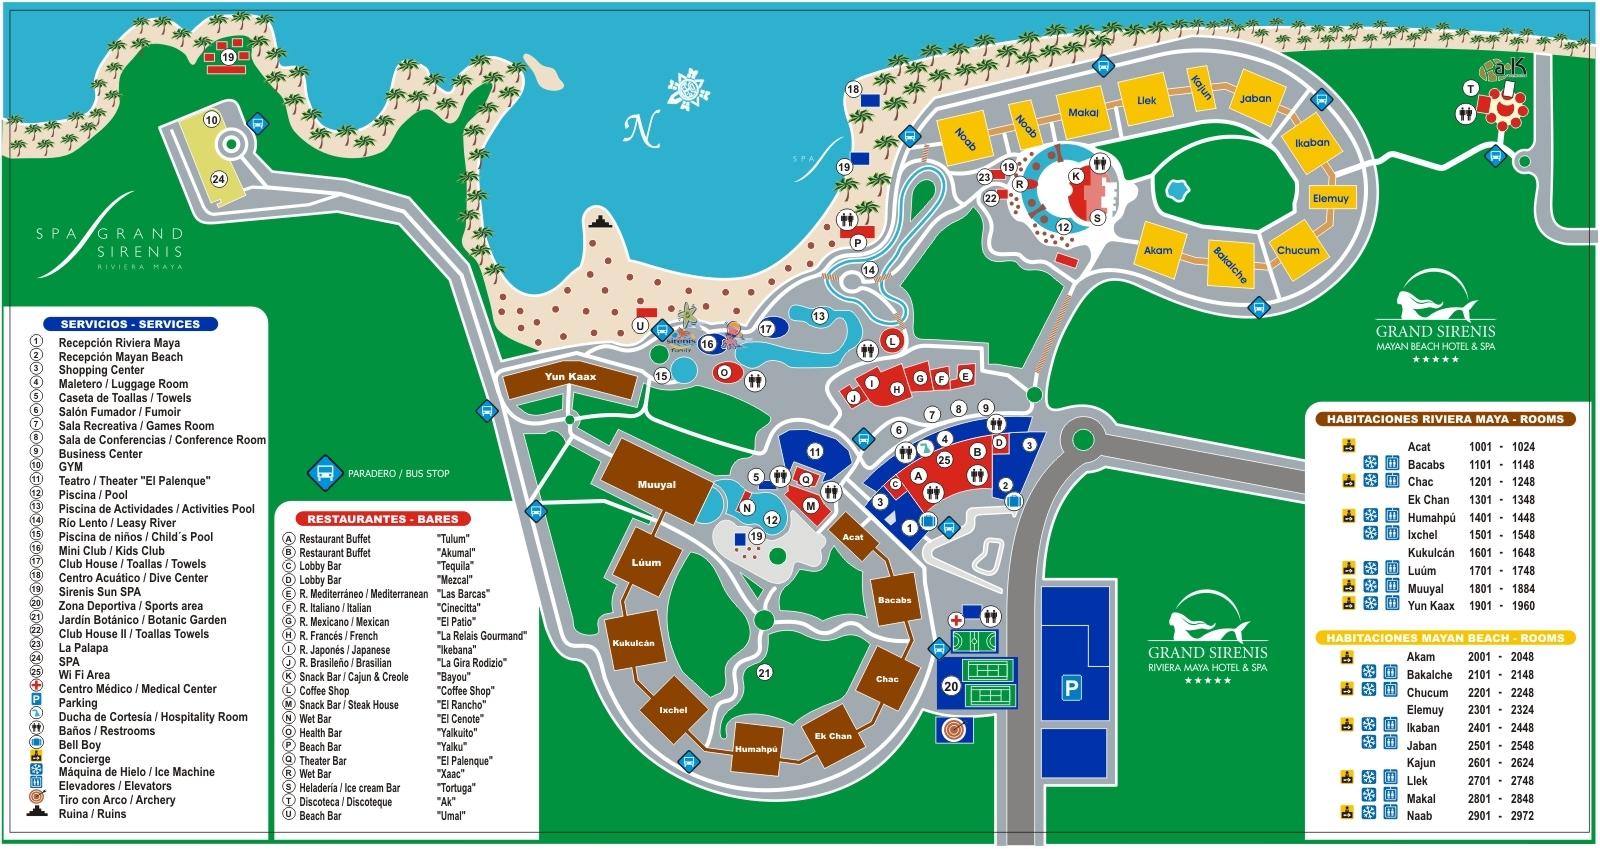 riviera maya maps with Grand Sirenis Mayan Beach Hotel Spa Map on Maps playa del carmen riviera maya additionally Mexico beaches also Beja A Capital Do Baixo Alentejo furthermore Grand Sirenis Mayan Beach Hotel Spa Map together with Xenses Park.